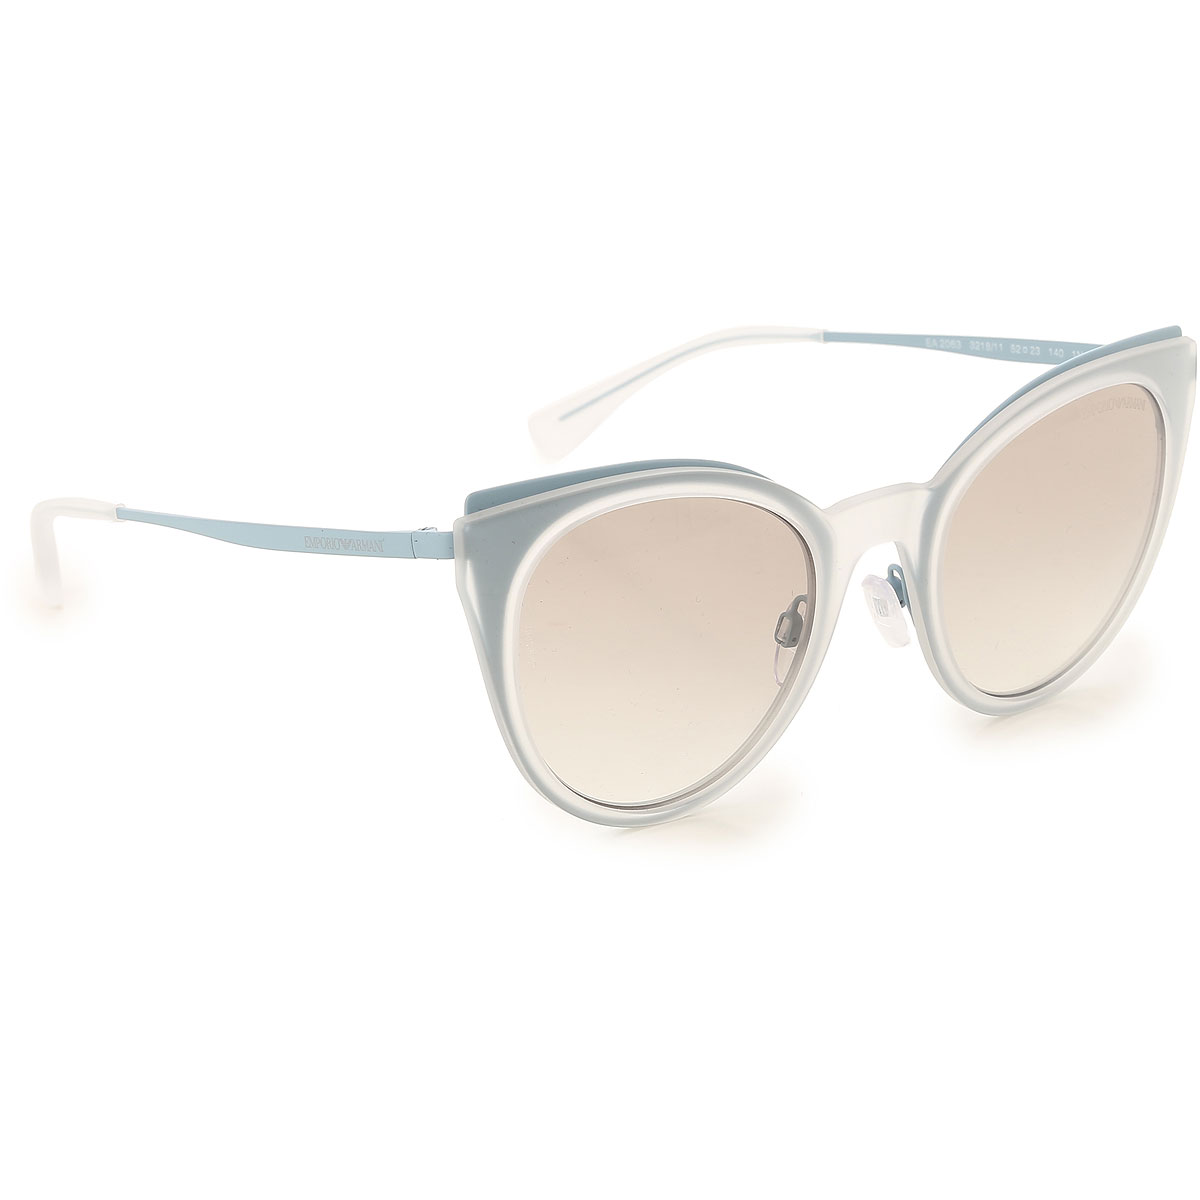 Image of Emporio Armani Sunglasses On Sale, Light Sky Blue, 2017